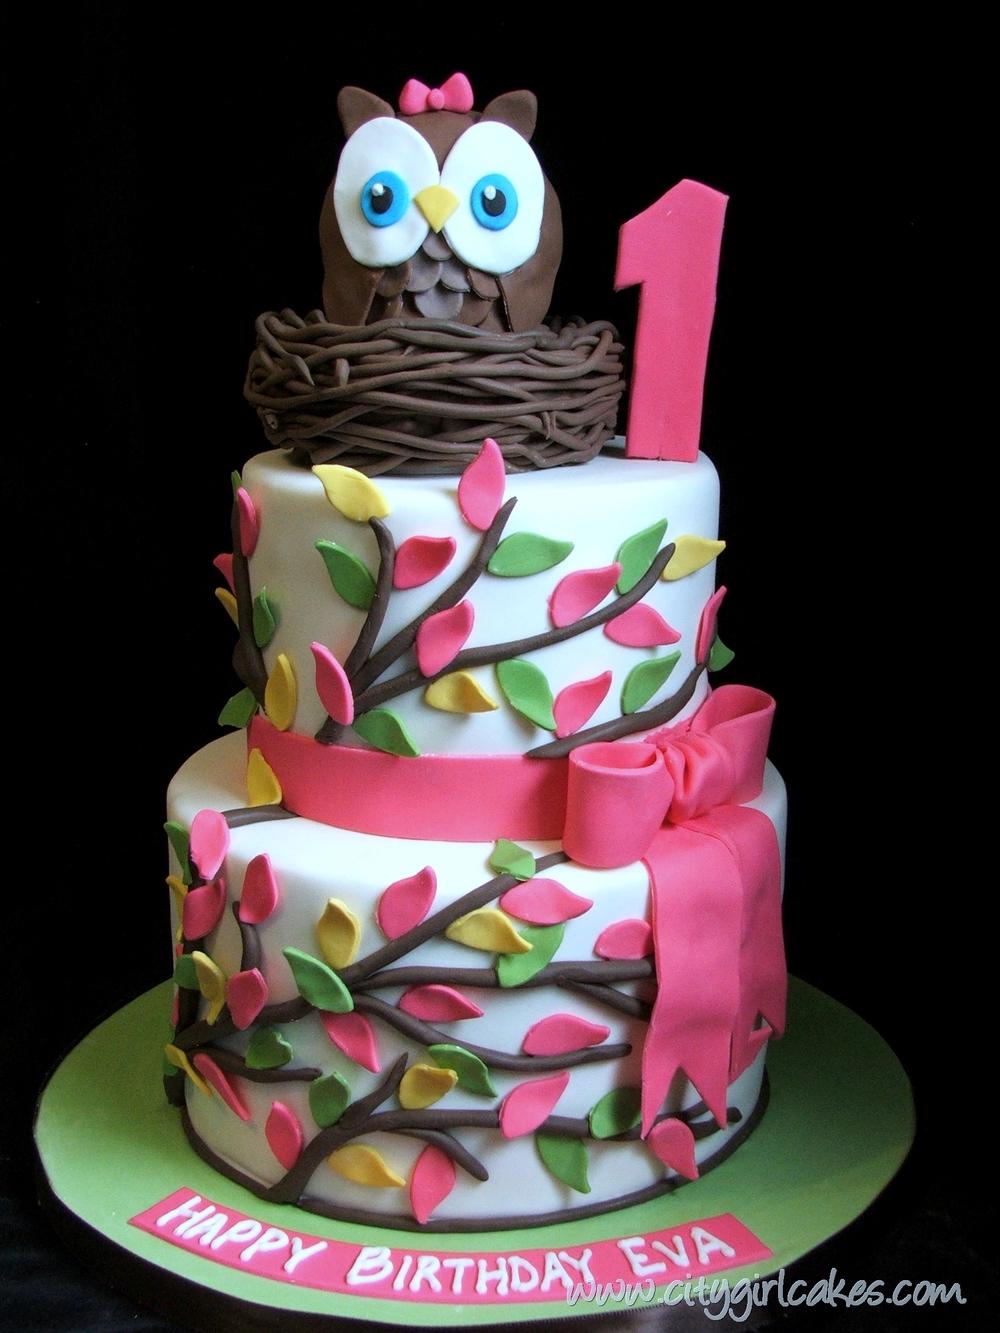 Whooooos One Invitation Inspiration City Girl Cakes